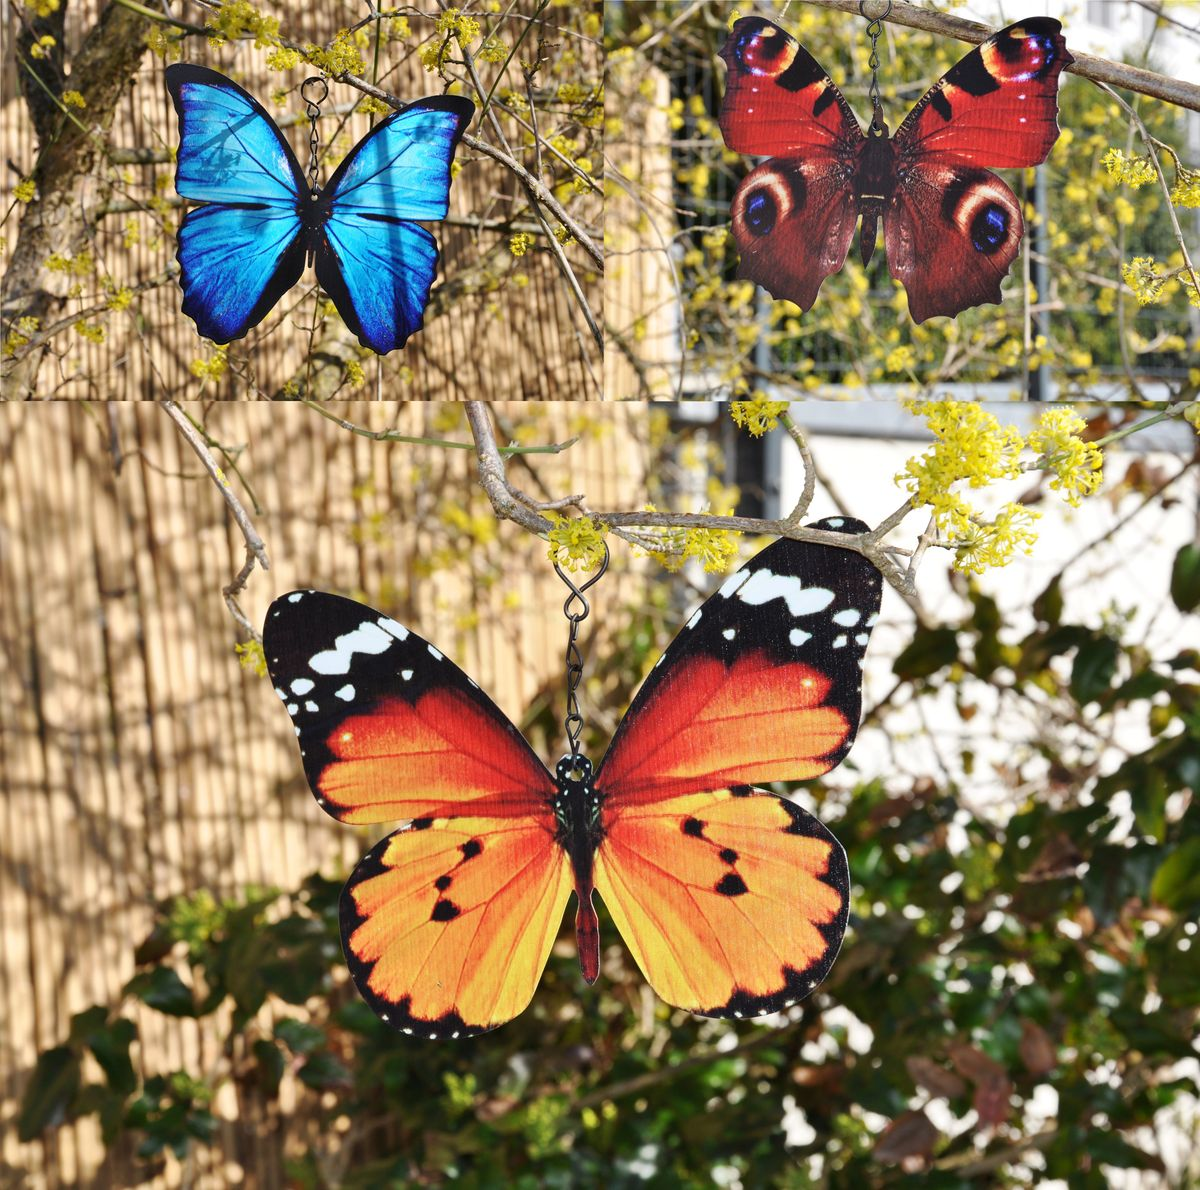 Deko Schmetterlinge Metall.3 Schmetterlinge Metall Aufhänger Bunt Schmetterling Windspiel Gartendeko 20cm